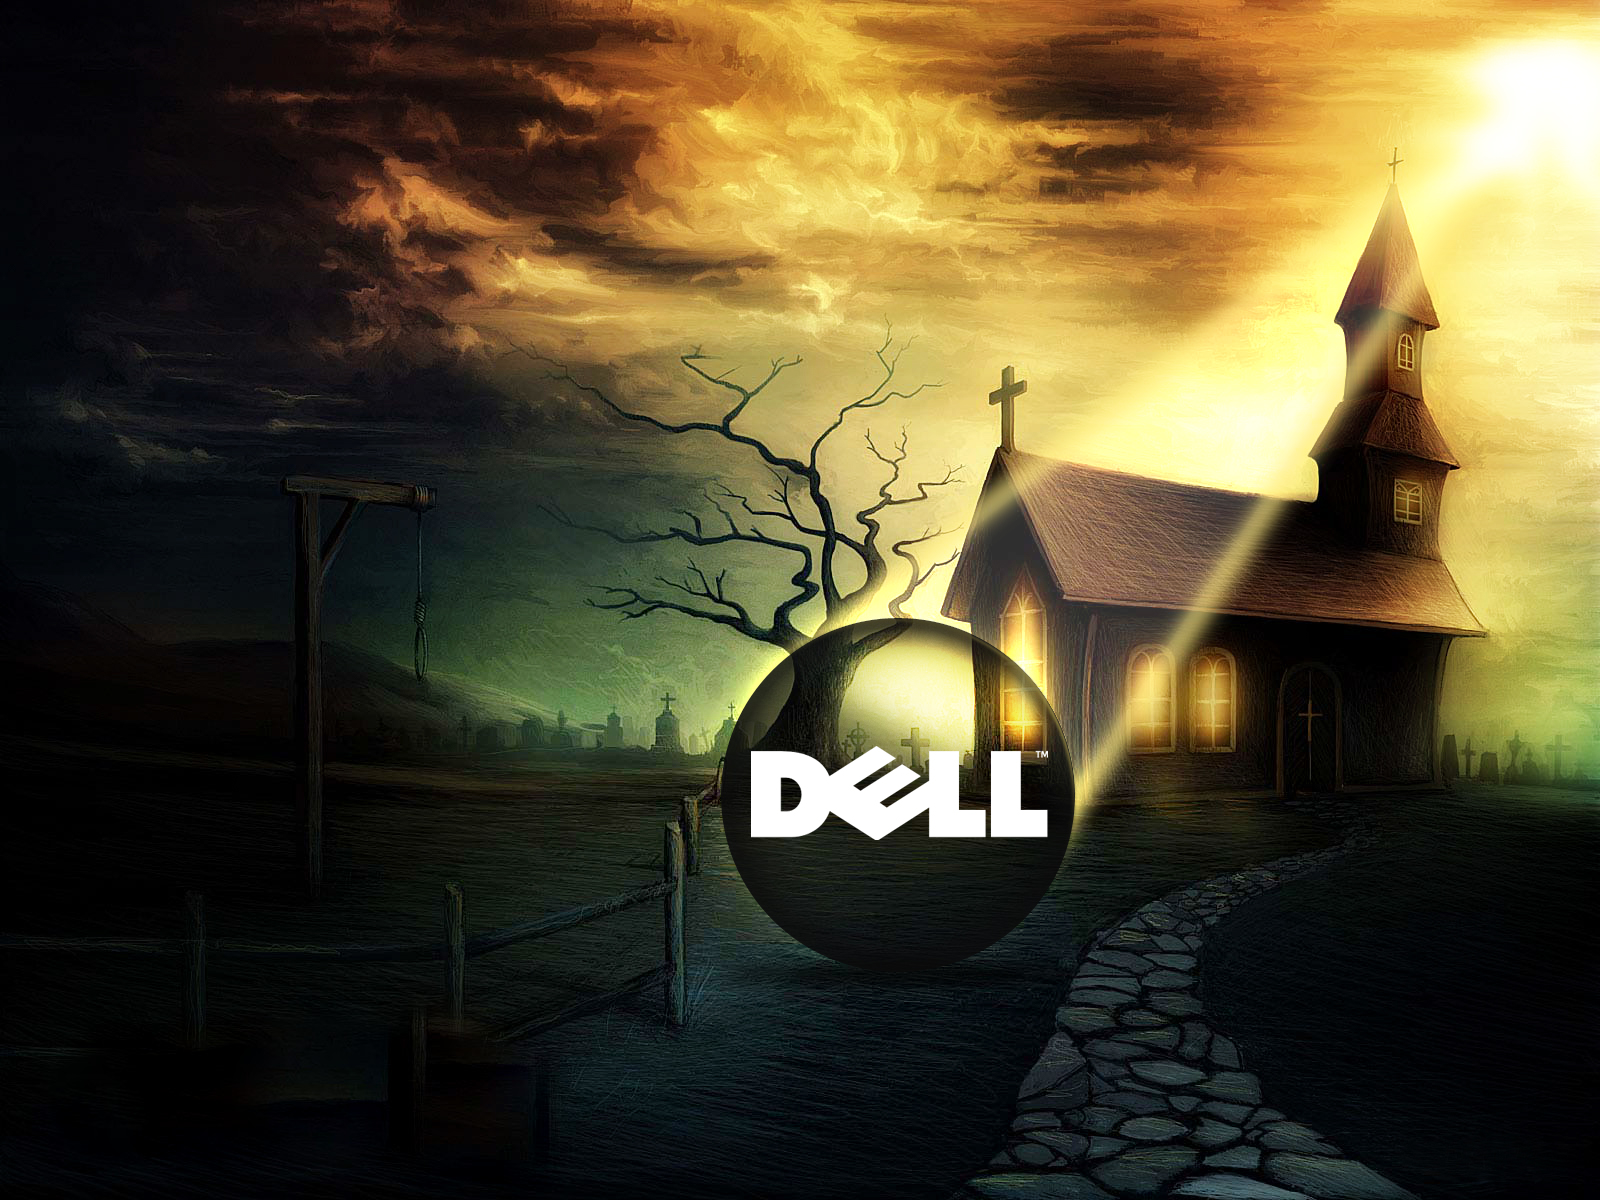 Dell Hd Wallpaper 1920x1080 Hd Wallpaper